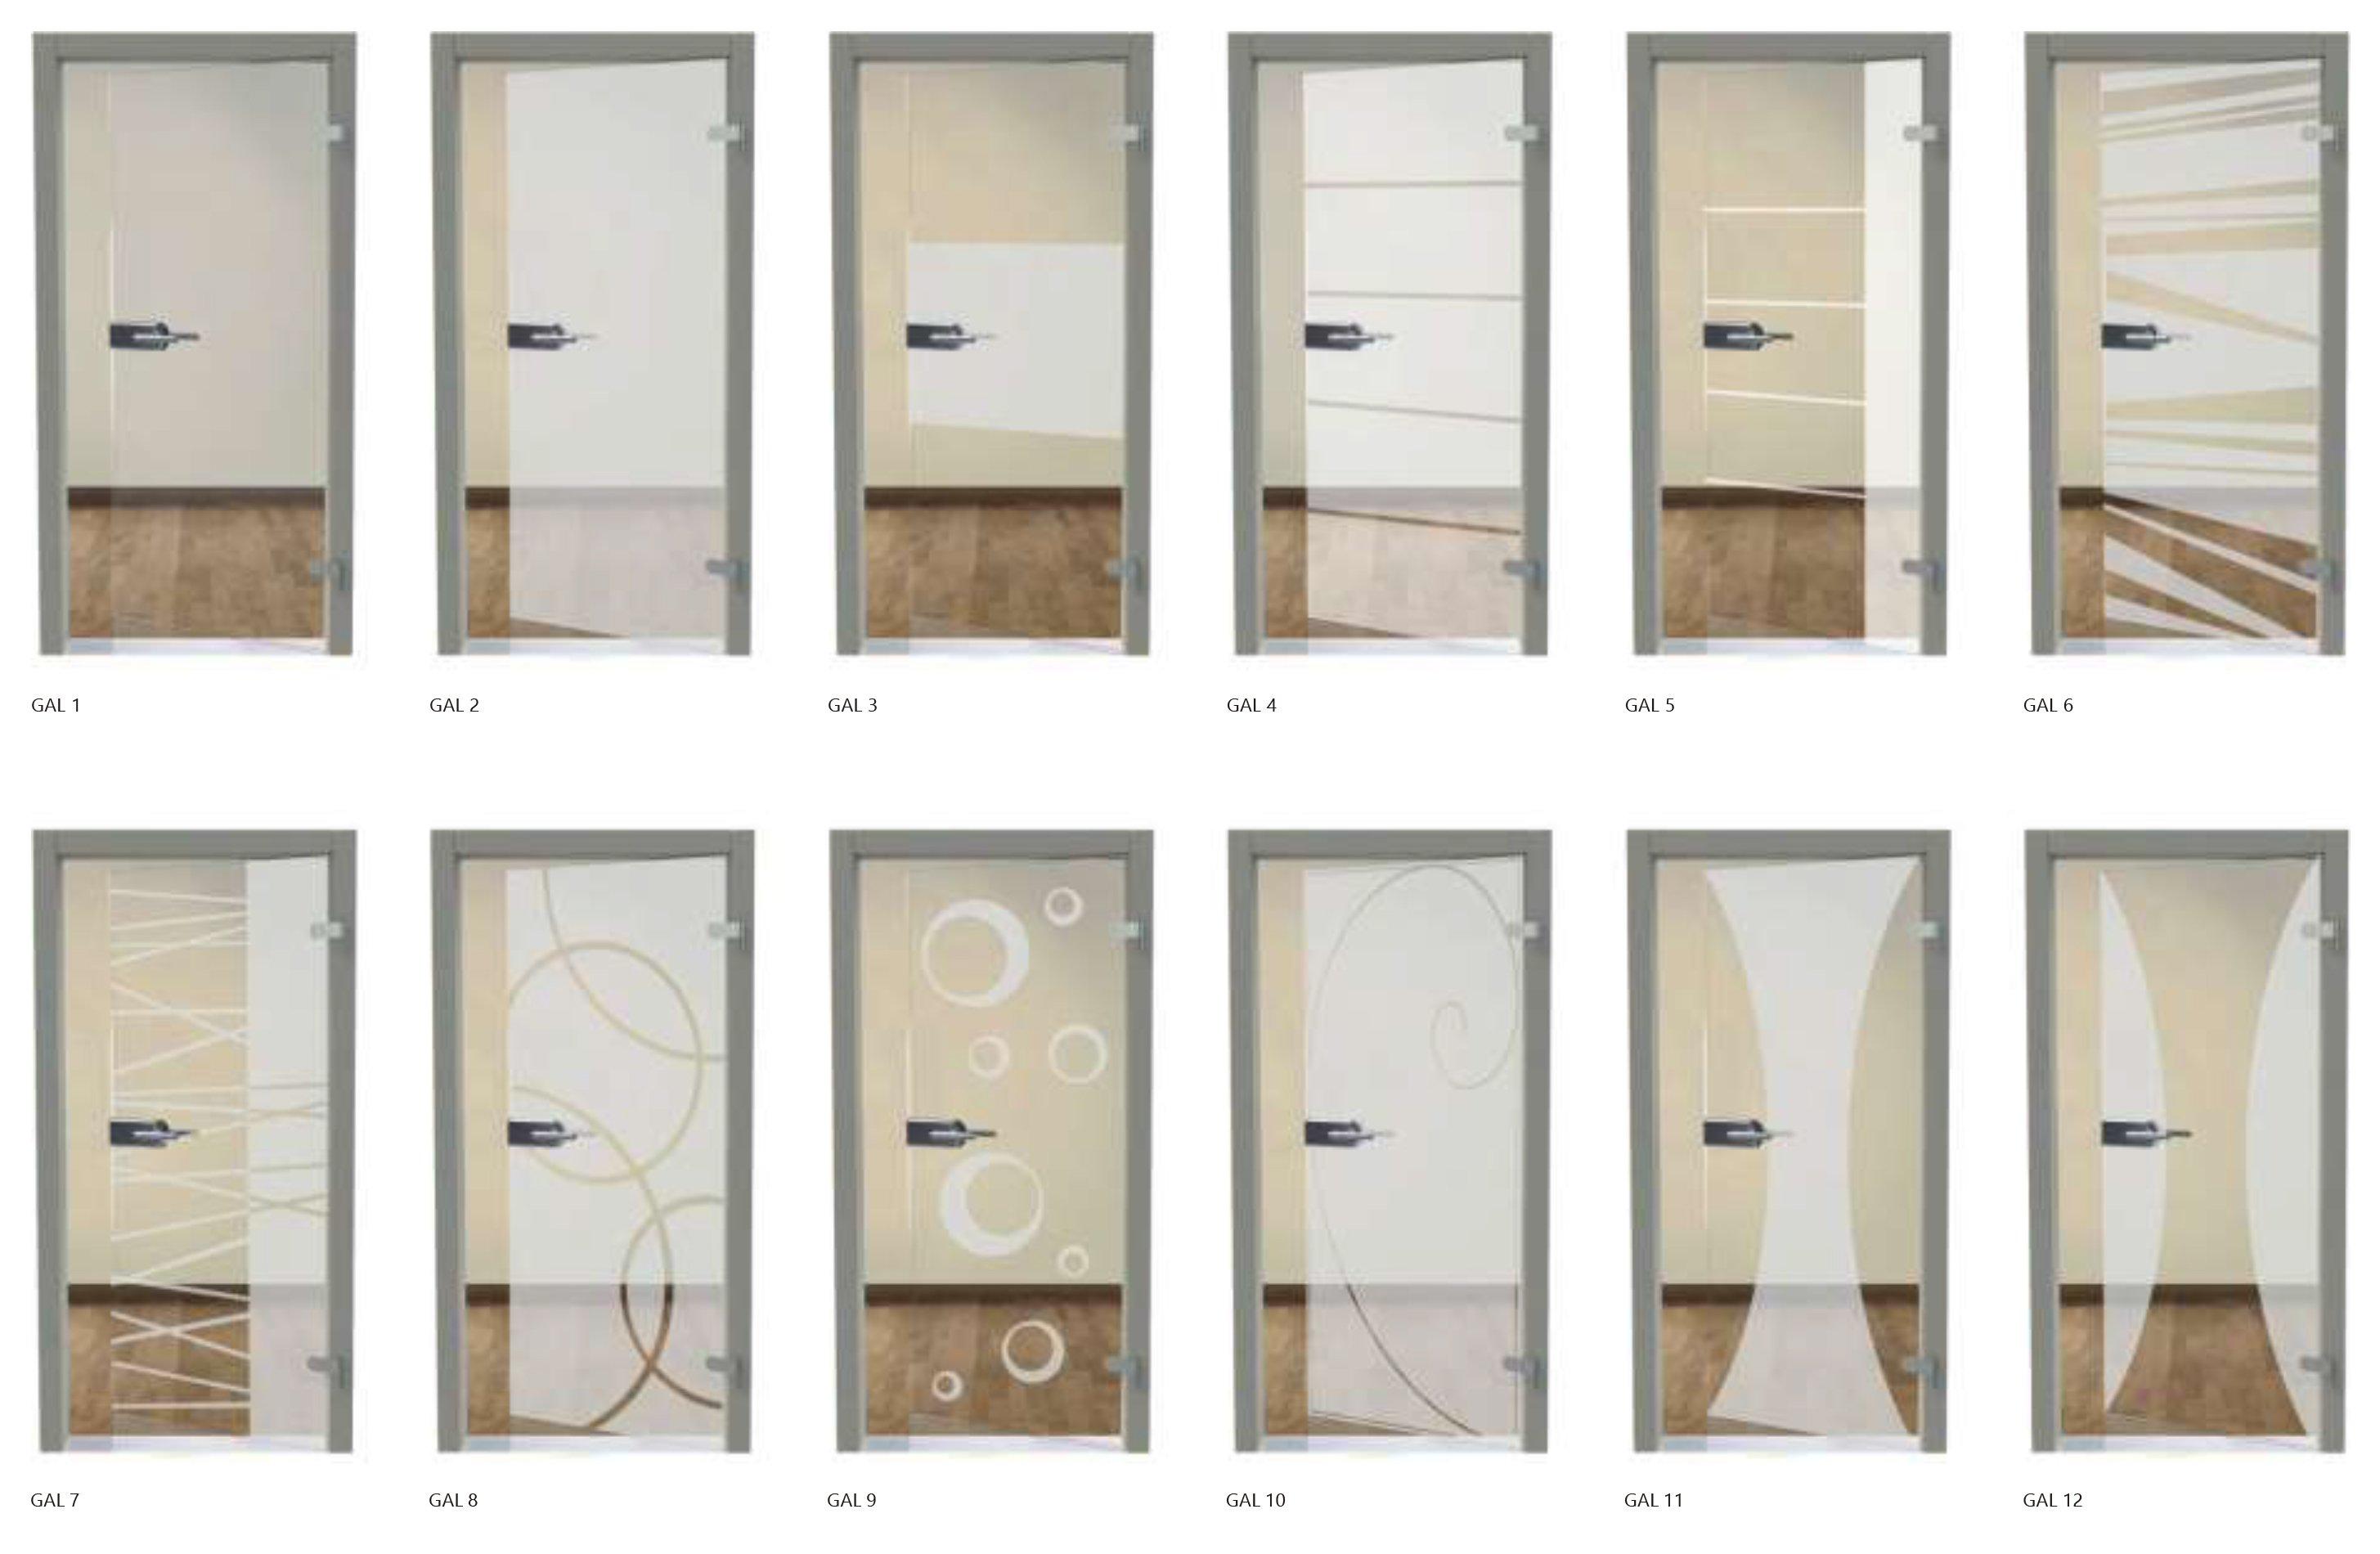 Porte interne glass art line